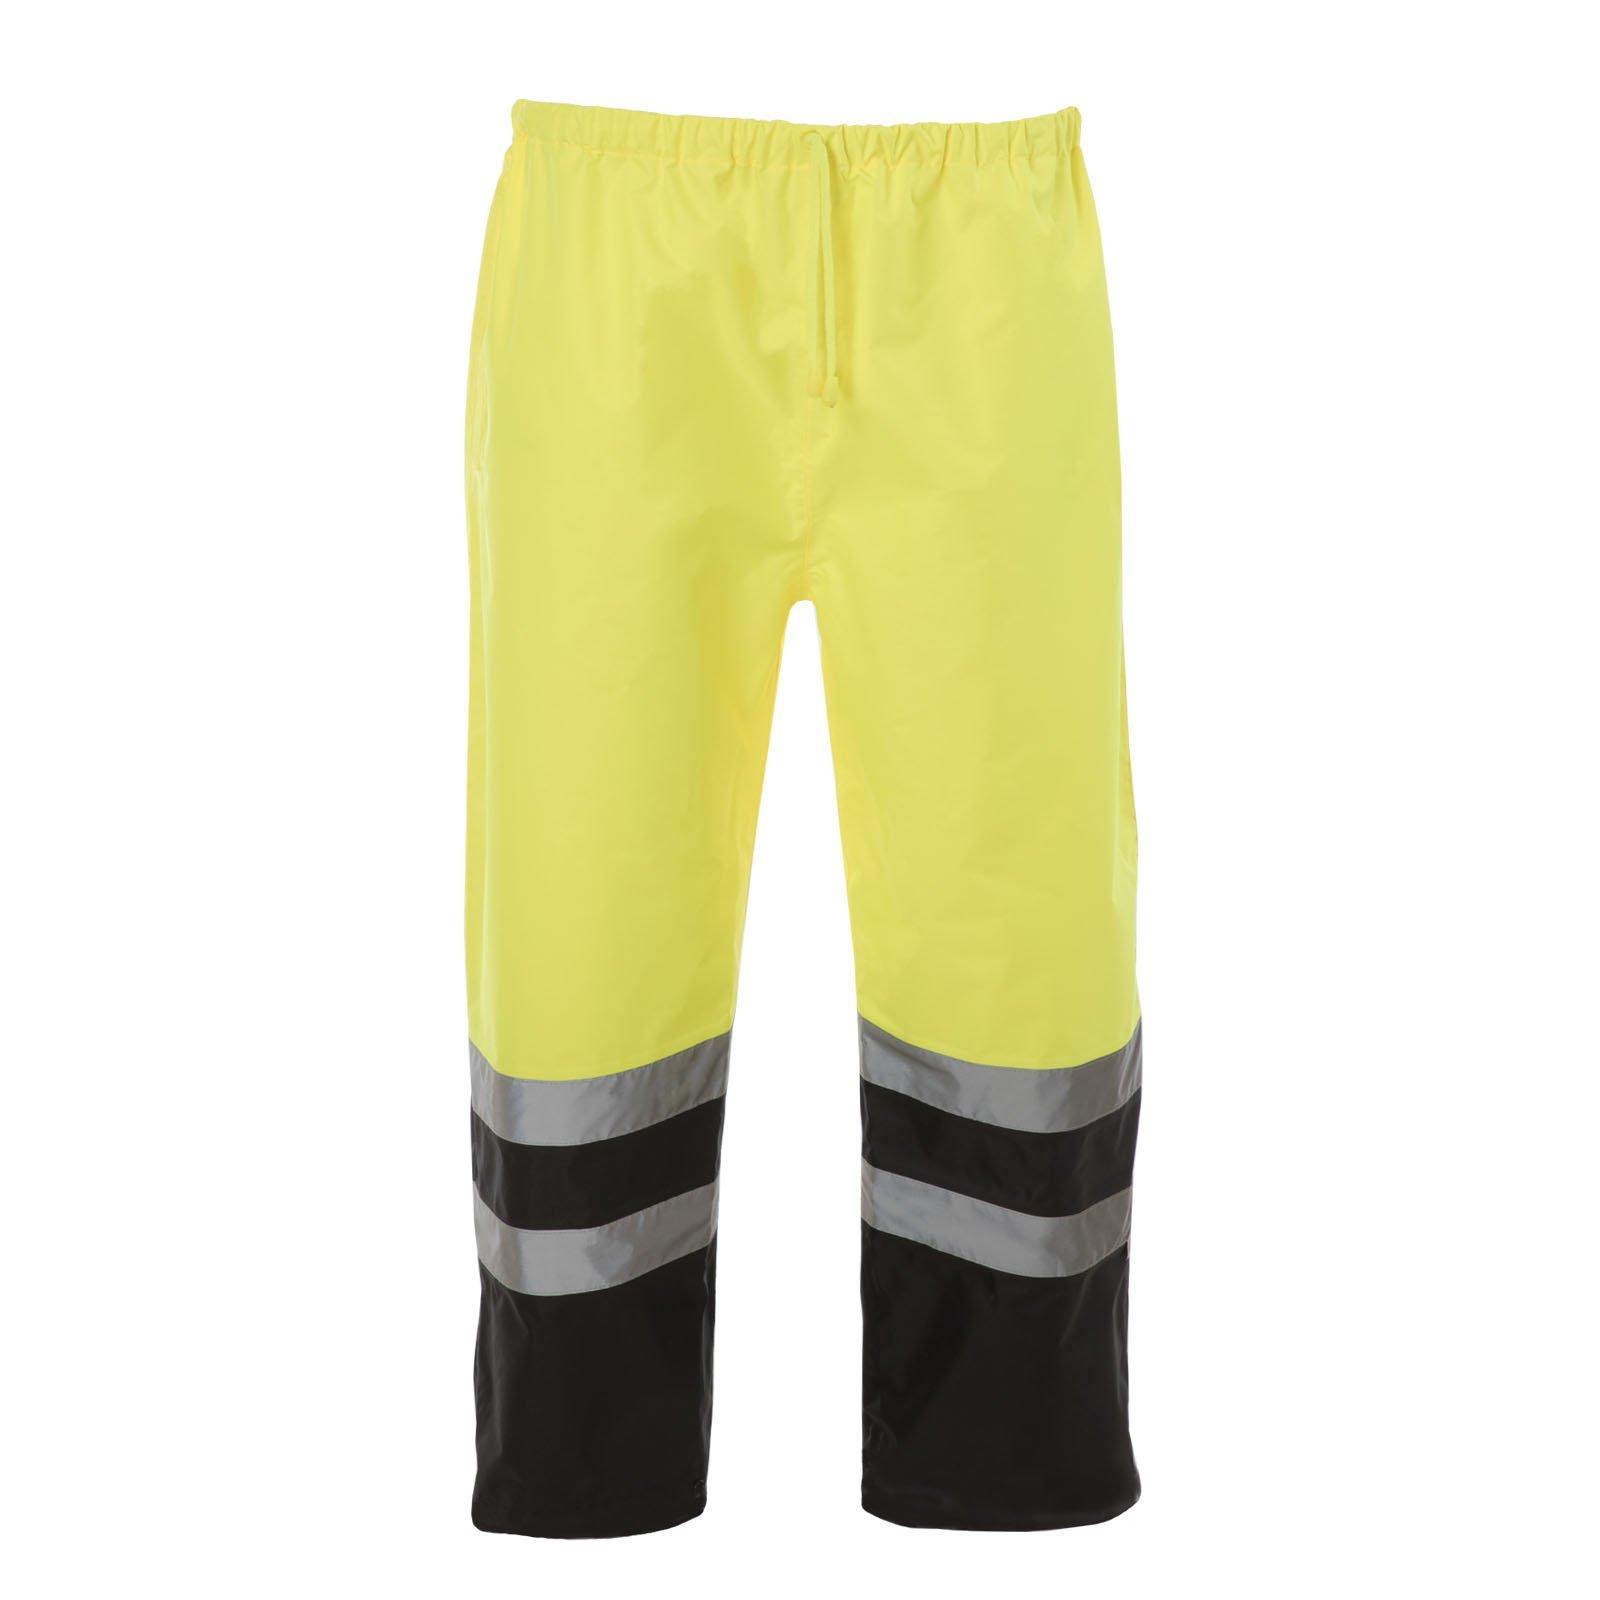 JORESTECH Light Weight Waterproof Rain Pants ANSI/ISEA 107-2015 Class 3 Level 2 Black and Yellow (3X-Large) by JORESTECH (Image #1)